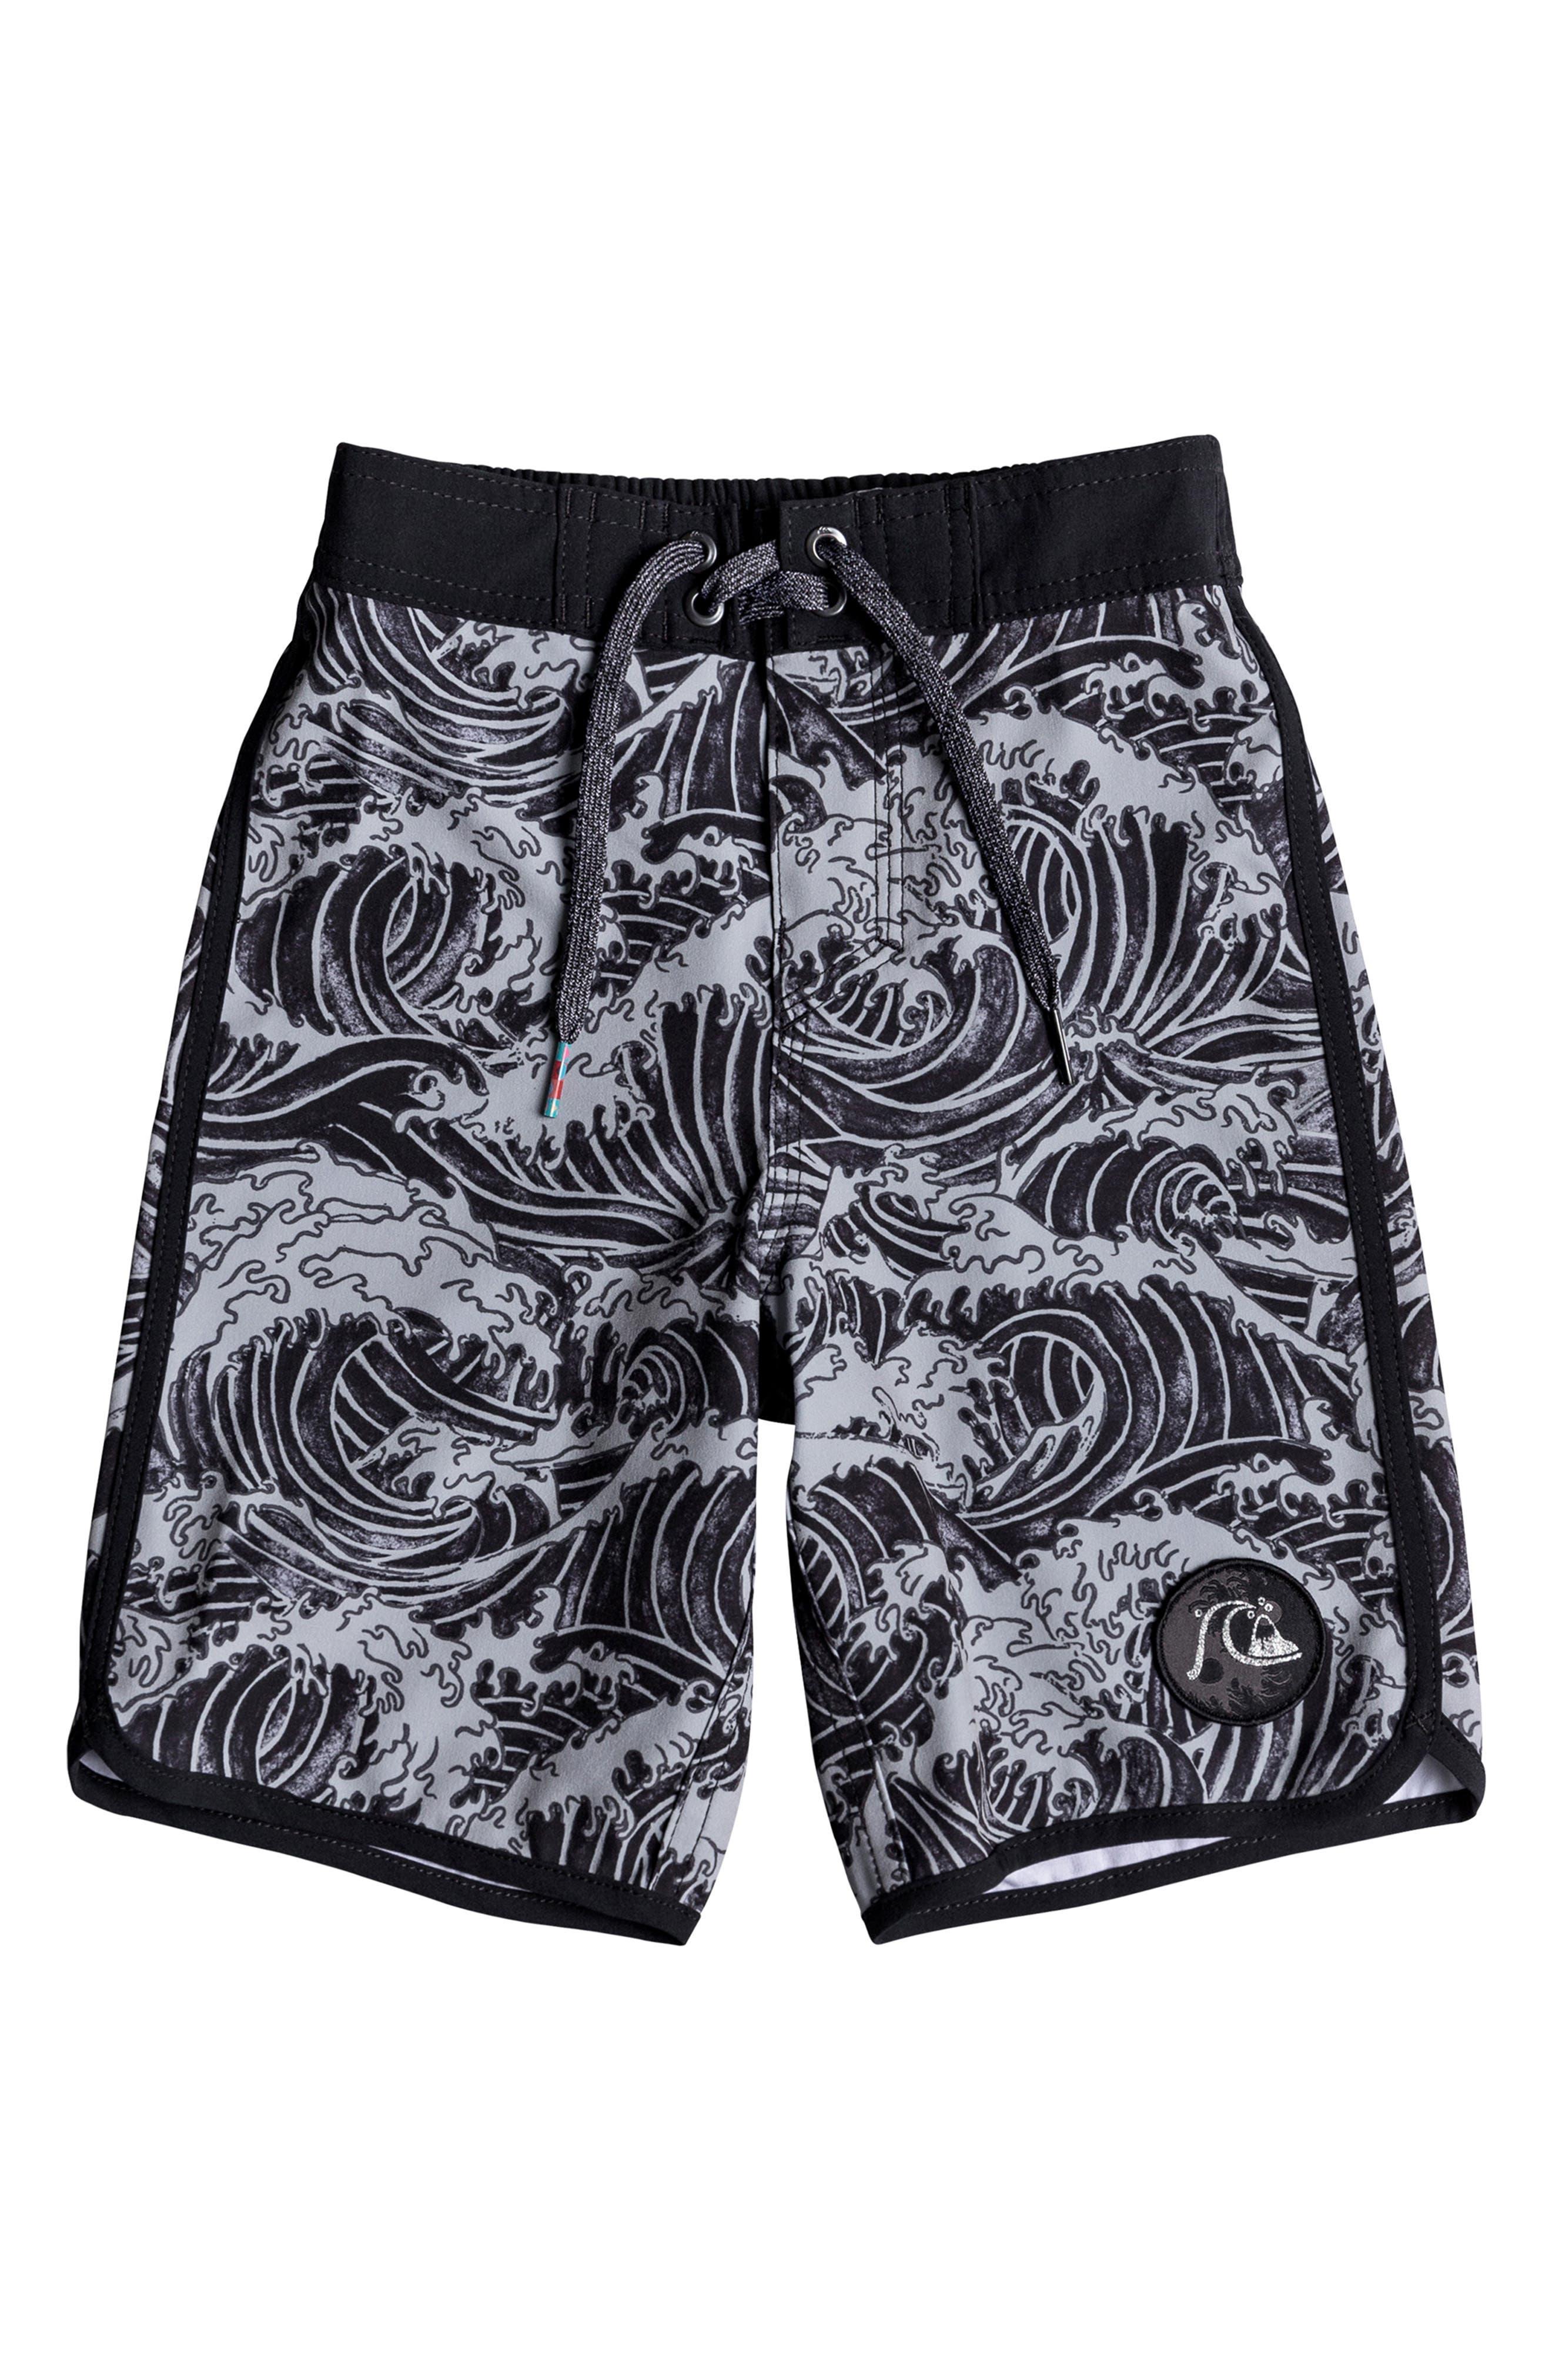 Highline Legend Board Shorts,                             Main thumbnail 1, color,                             BLACK